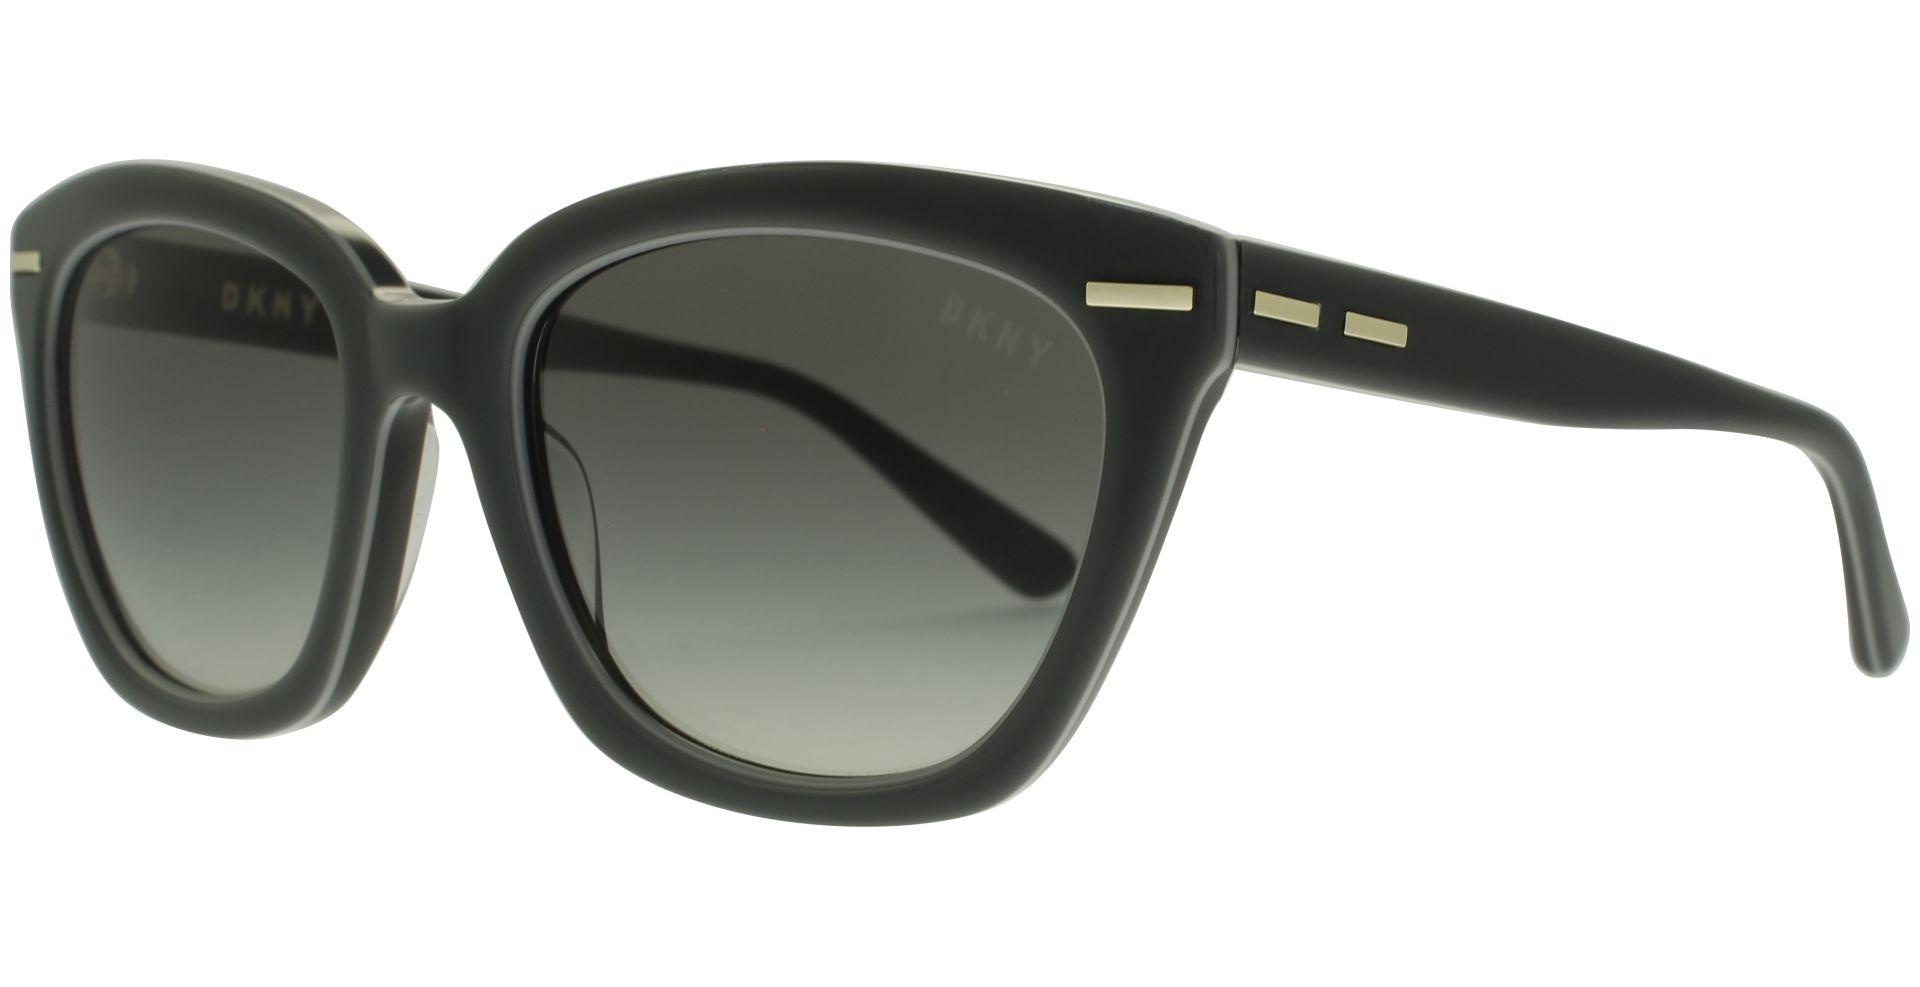 DKNY DY4142 Sonnenbrille Grau 372211 53mm HoD4RRU